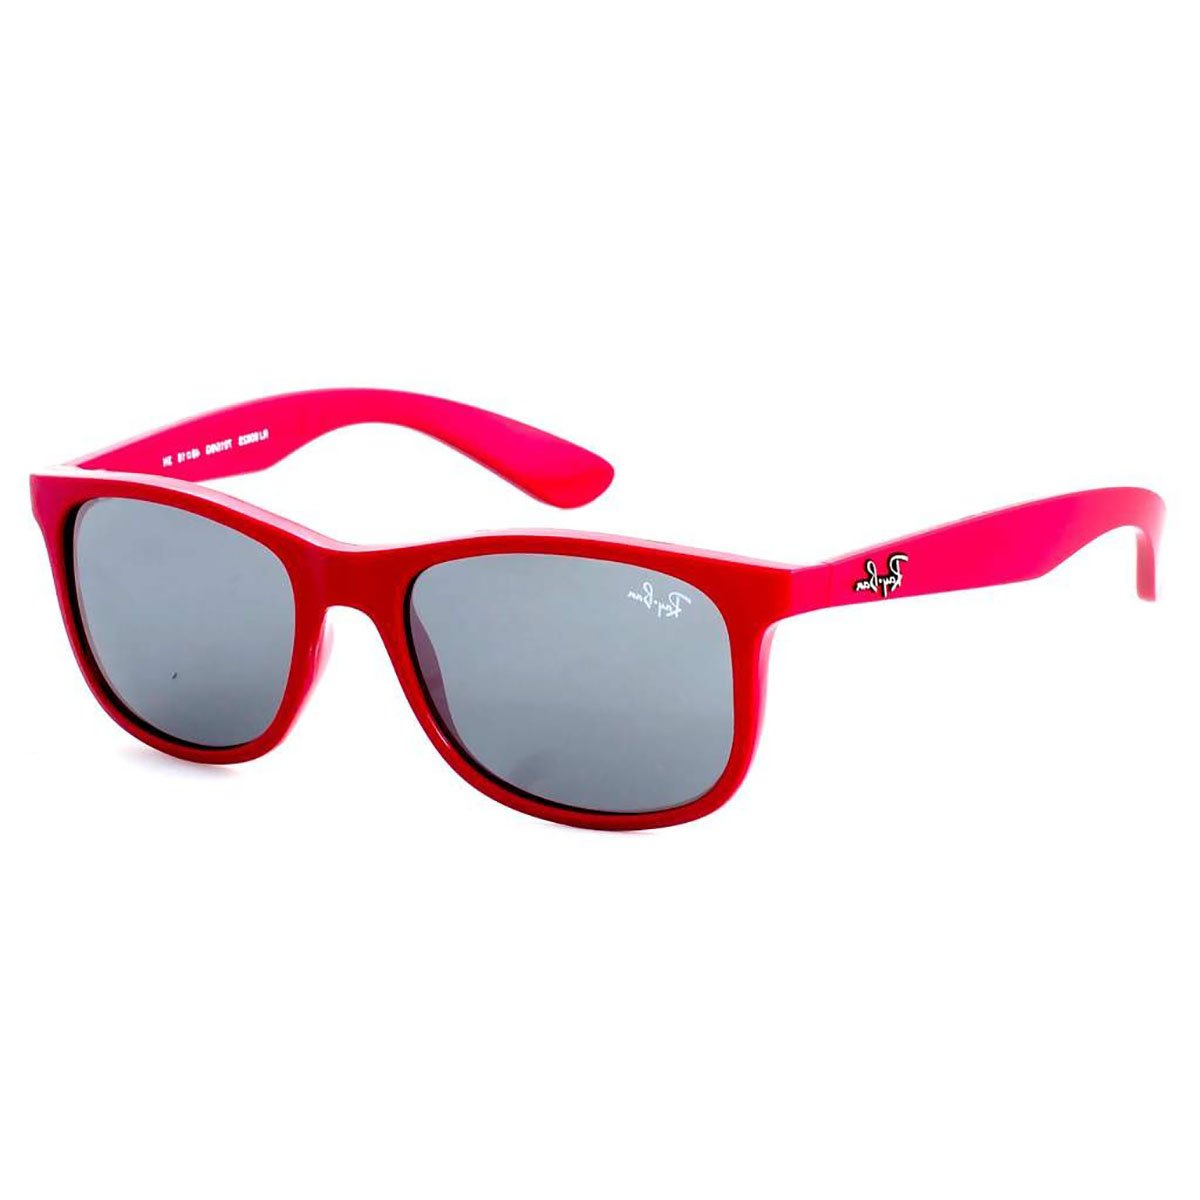 552dca31d5553 Óculos de Sol Ray Ban New Wayfarer Infantil. passe o mouse e veja detalhes